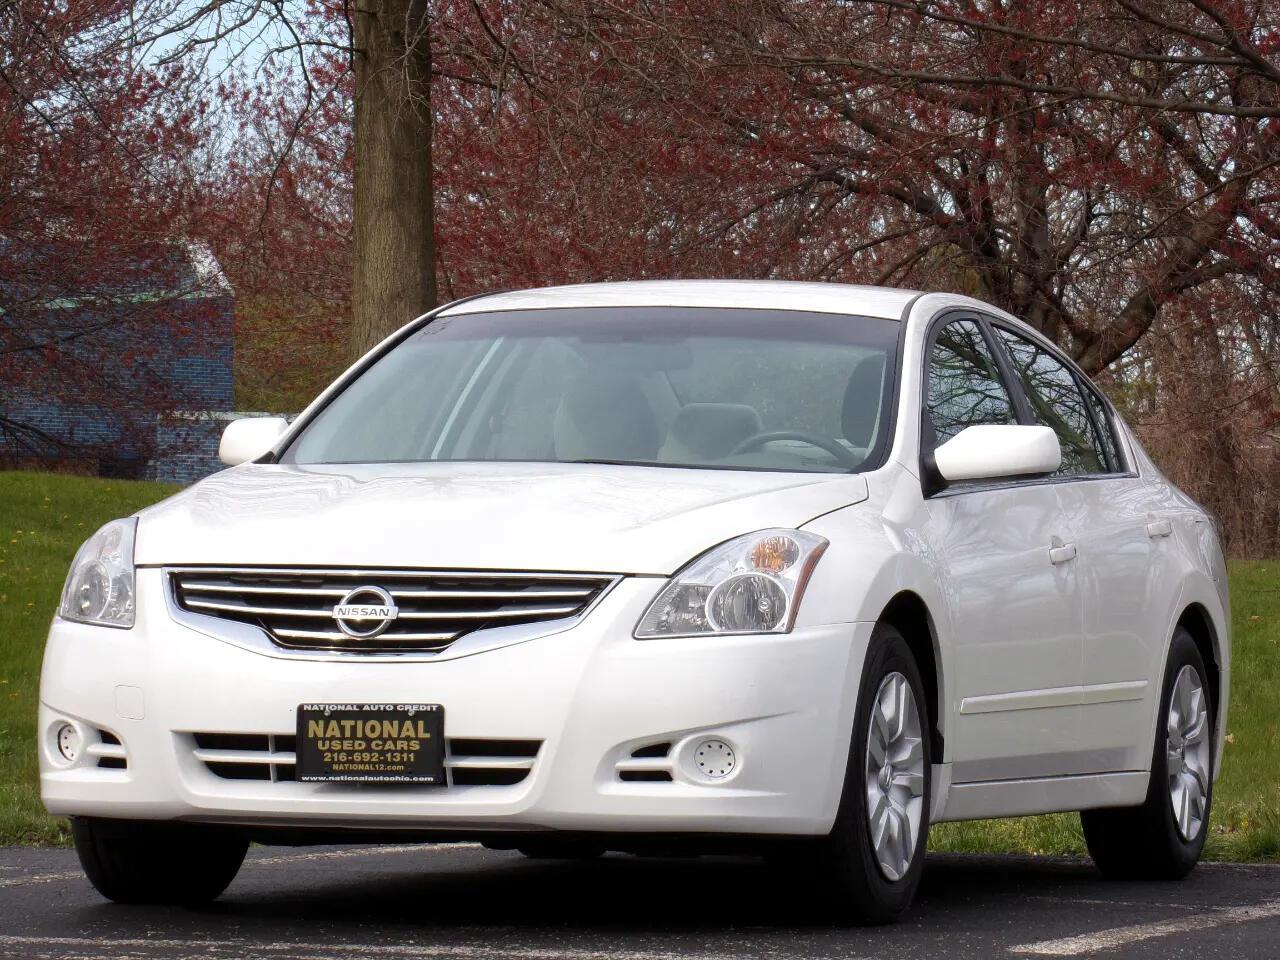 Nissan Altima 2.5 2012